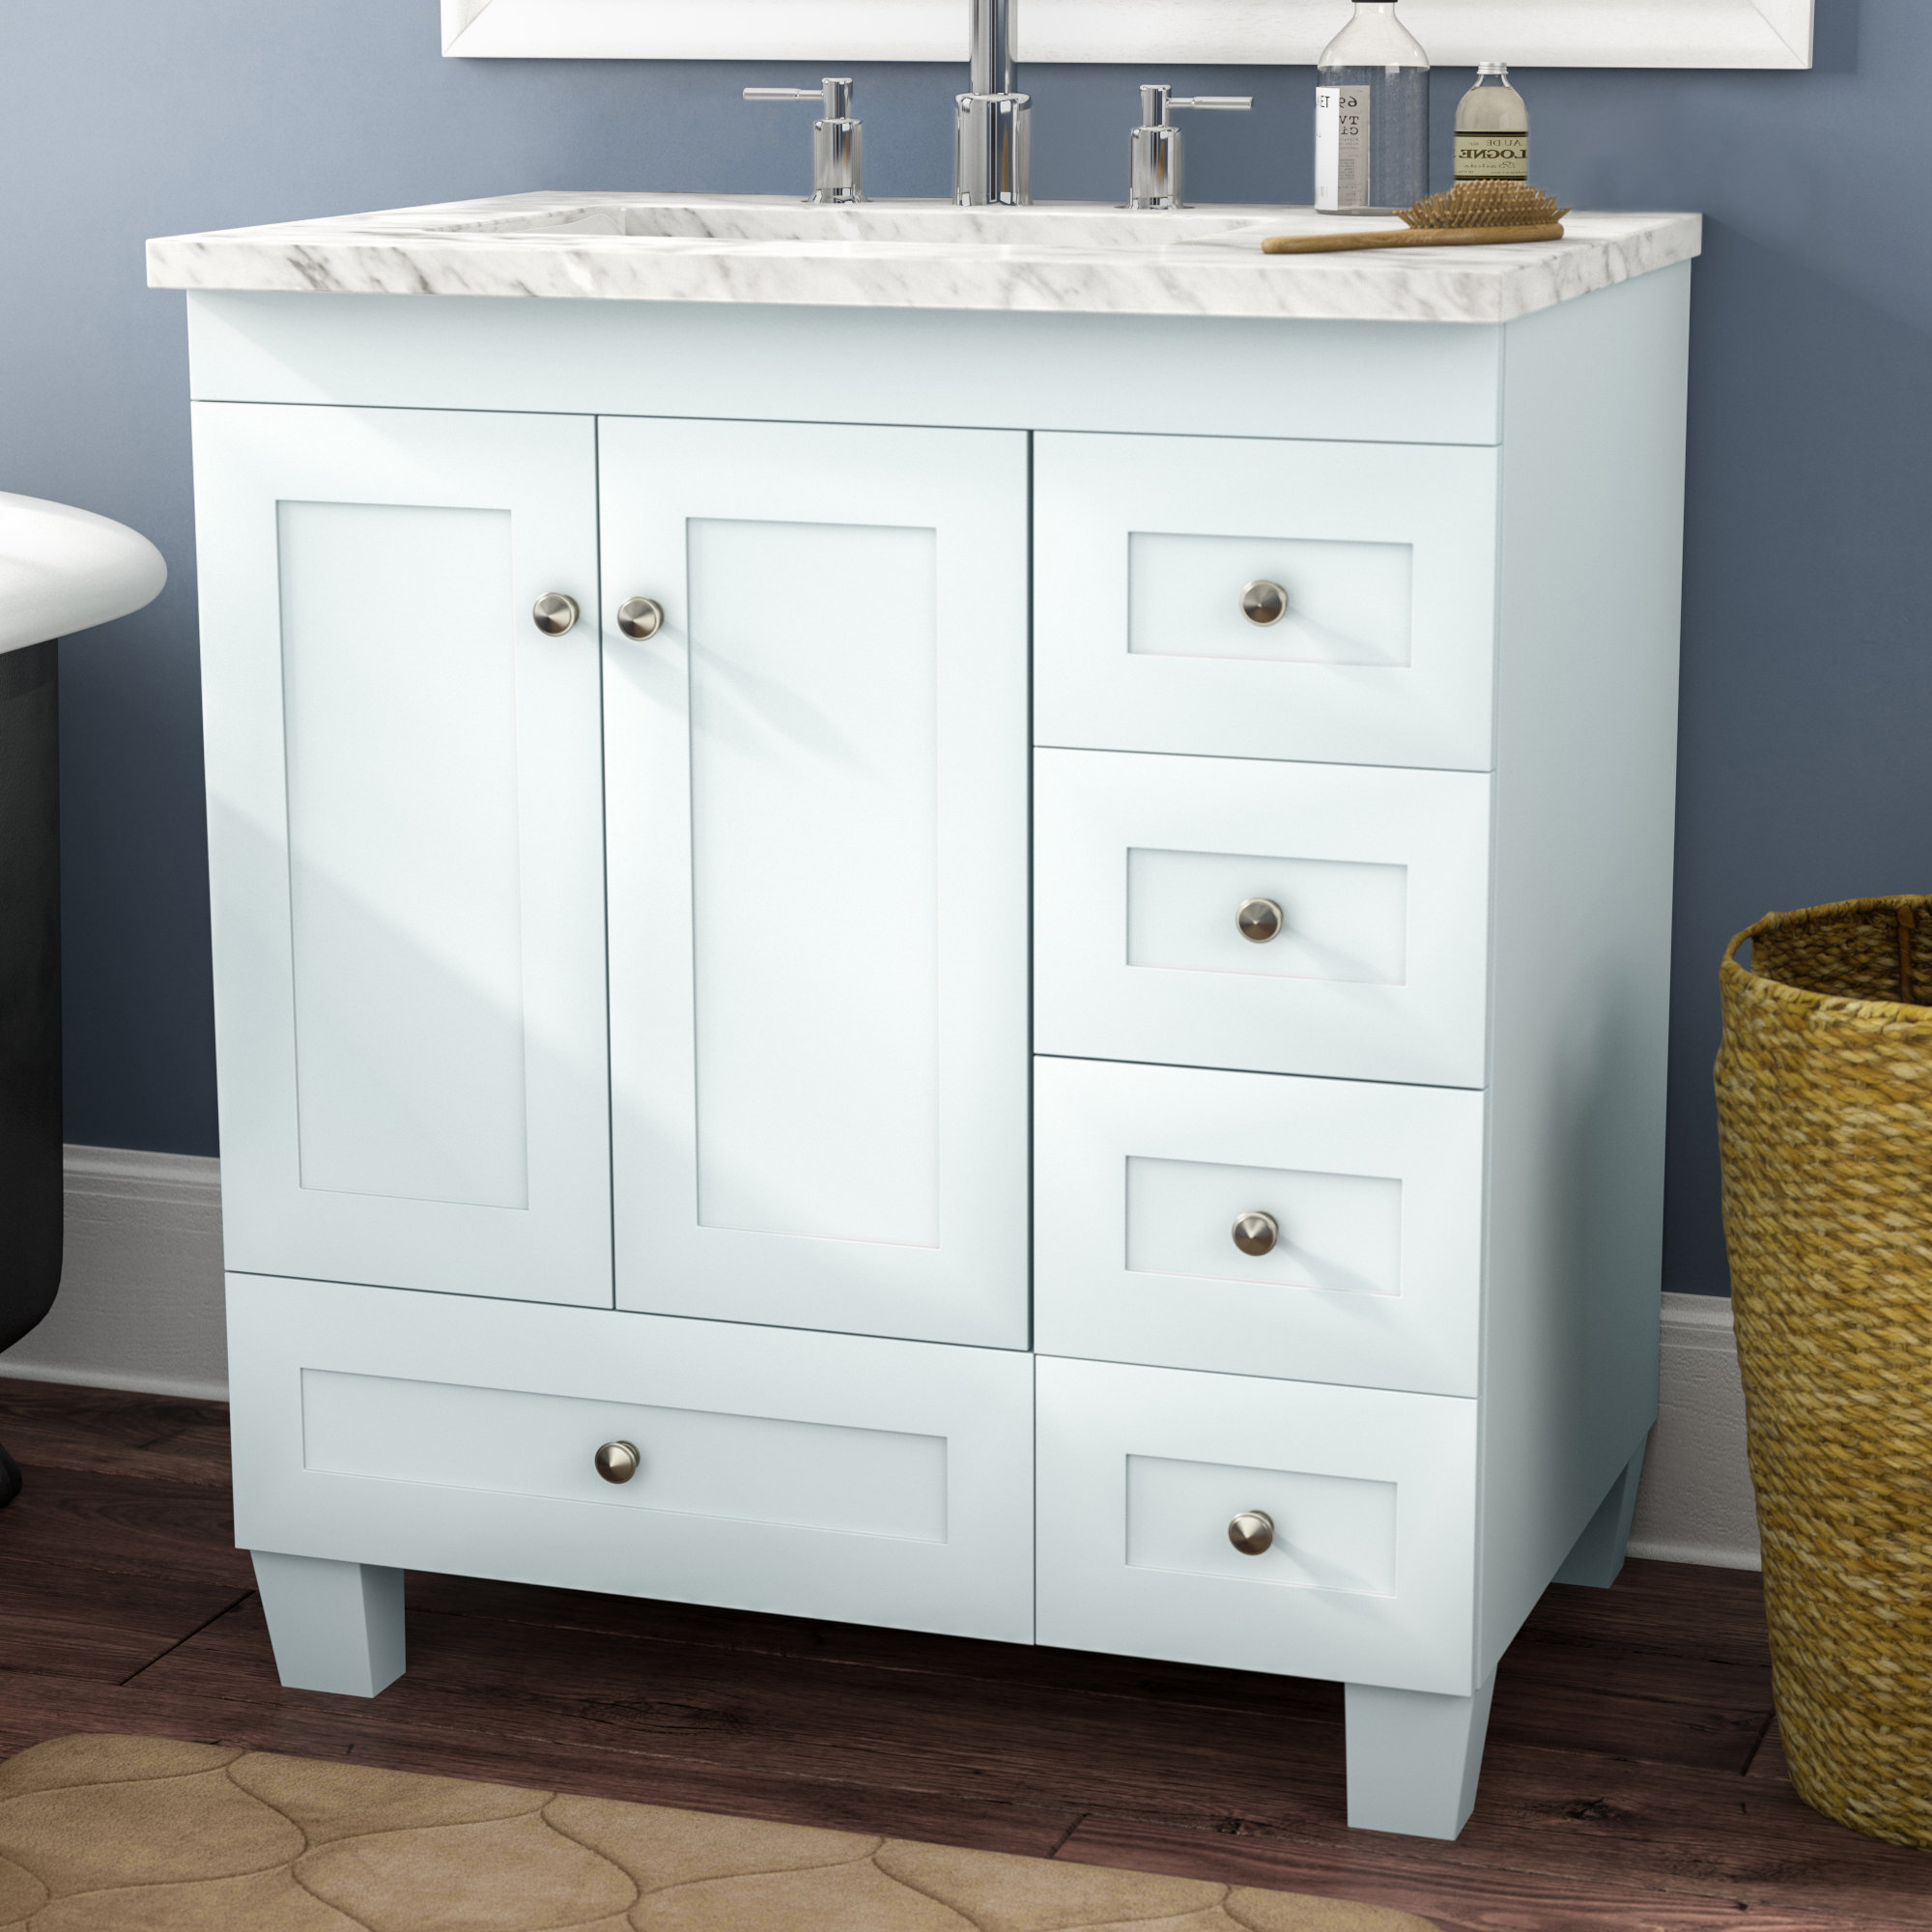 Three Posts Lauder 31 Single Bathroom Vanity Reviews Wayfair pertaining to size 2000 X 2000